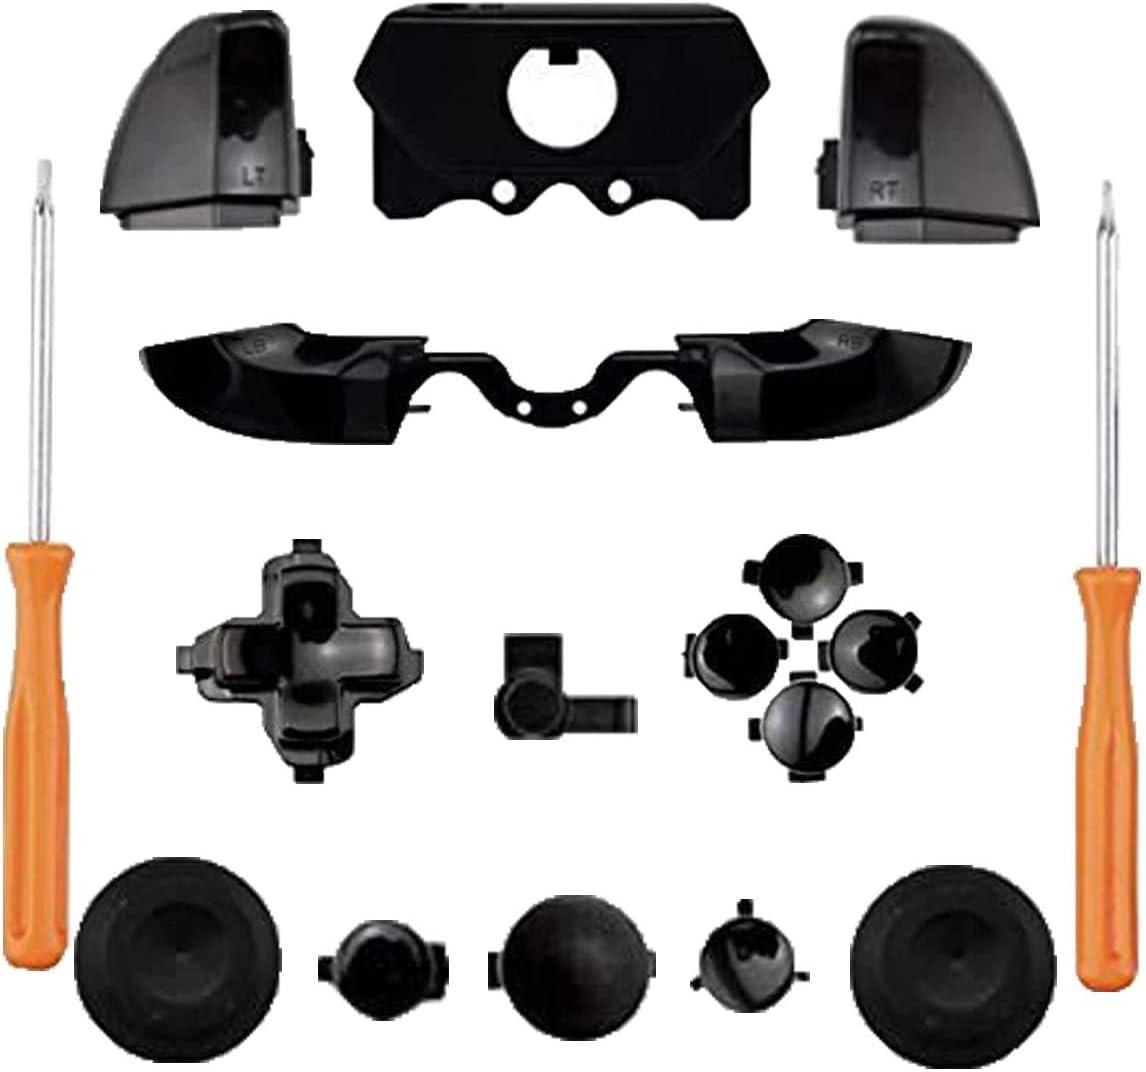 Awaqi Bumper Triggers Full Button Under blast sales Super beauty product restock quality top Dpad Guide+T8 LT LB RB RT ABXY